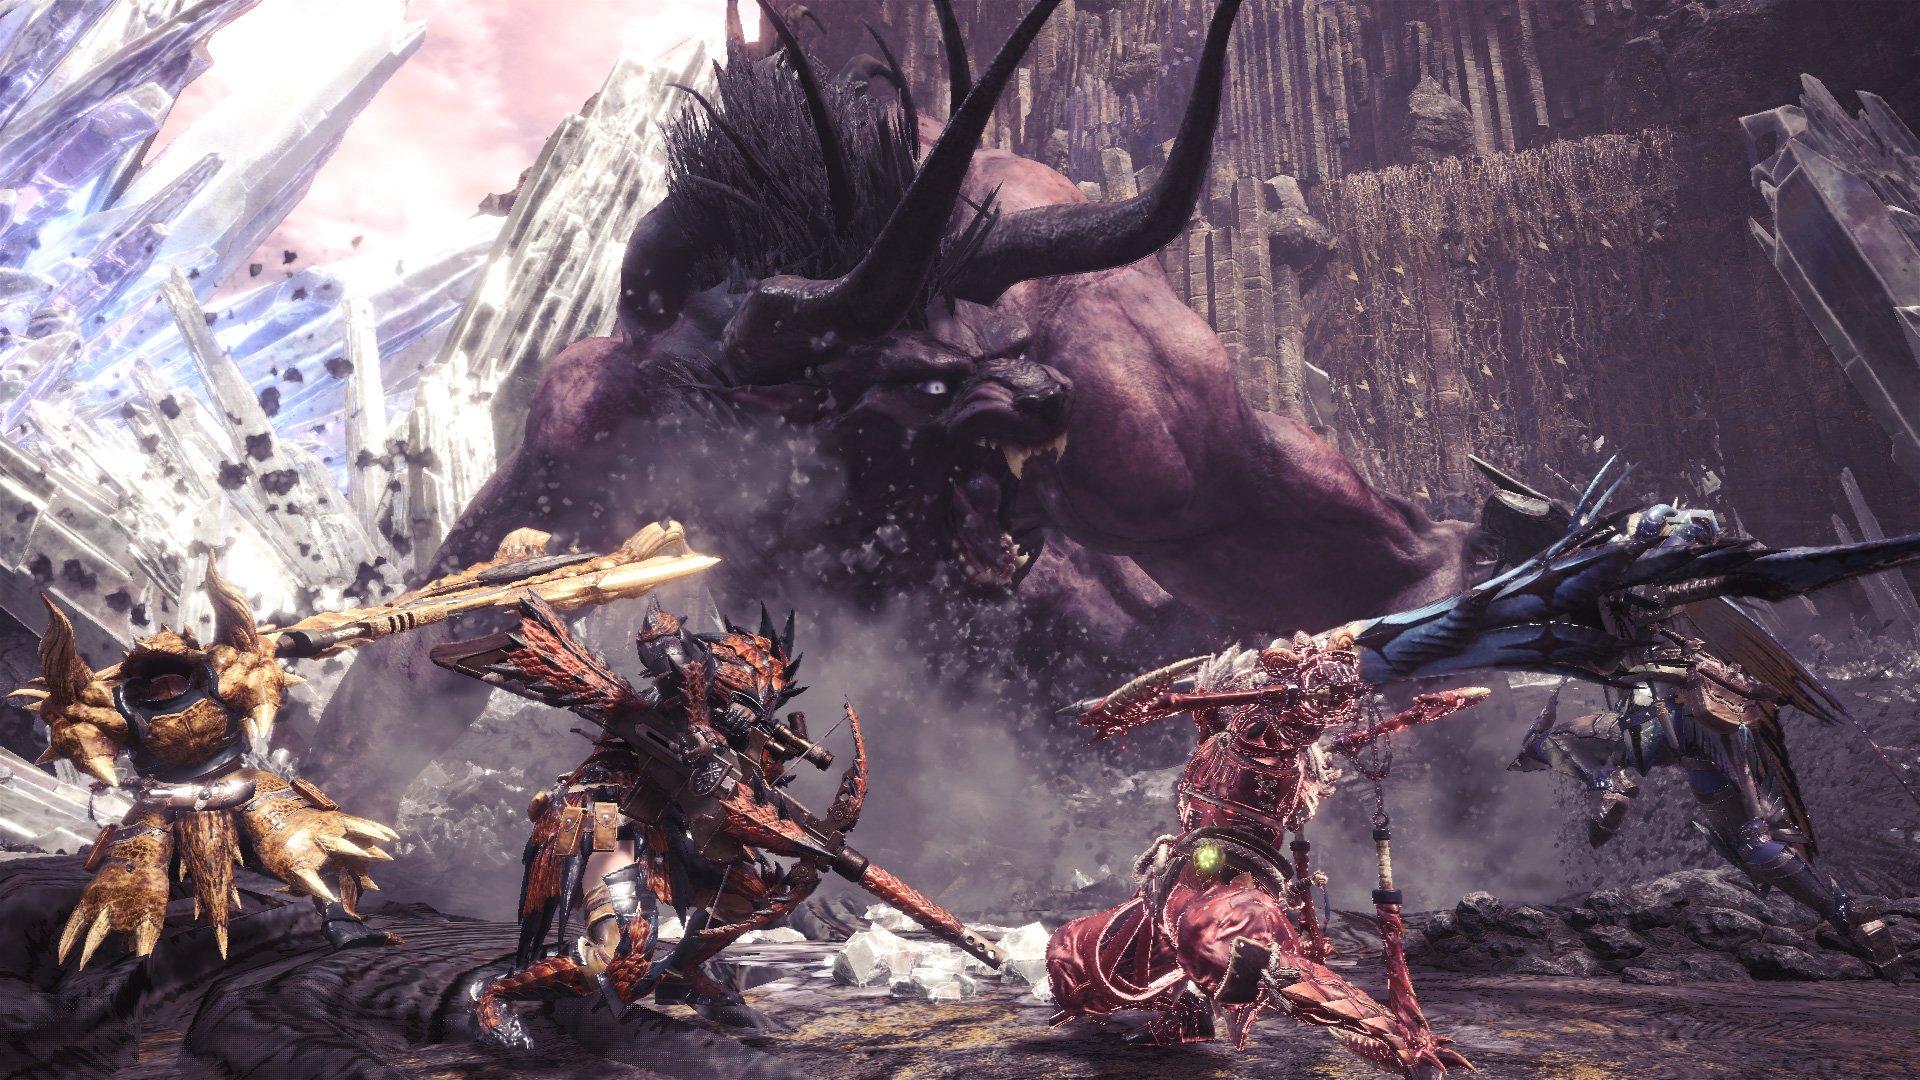 mua-monster-hunter-world-giá rẻ